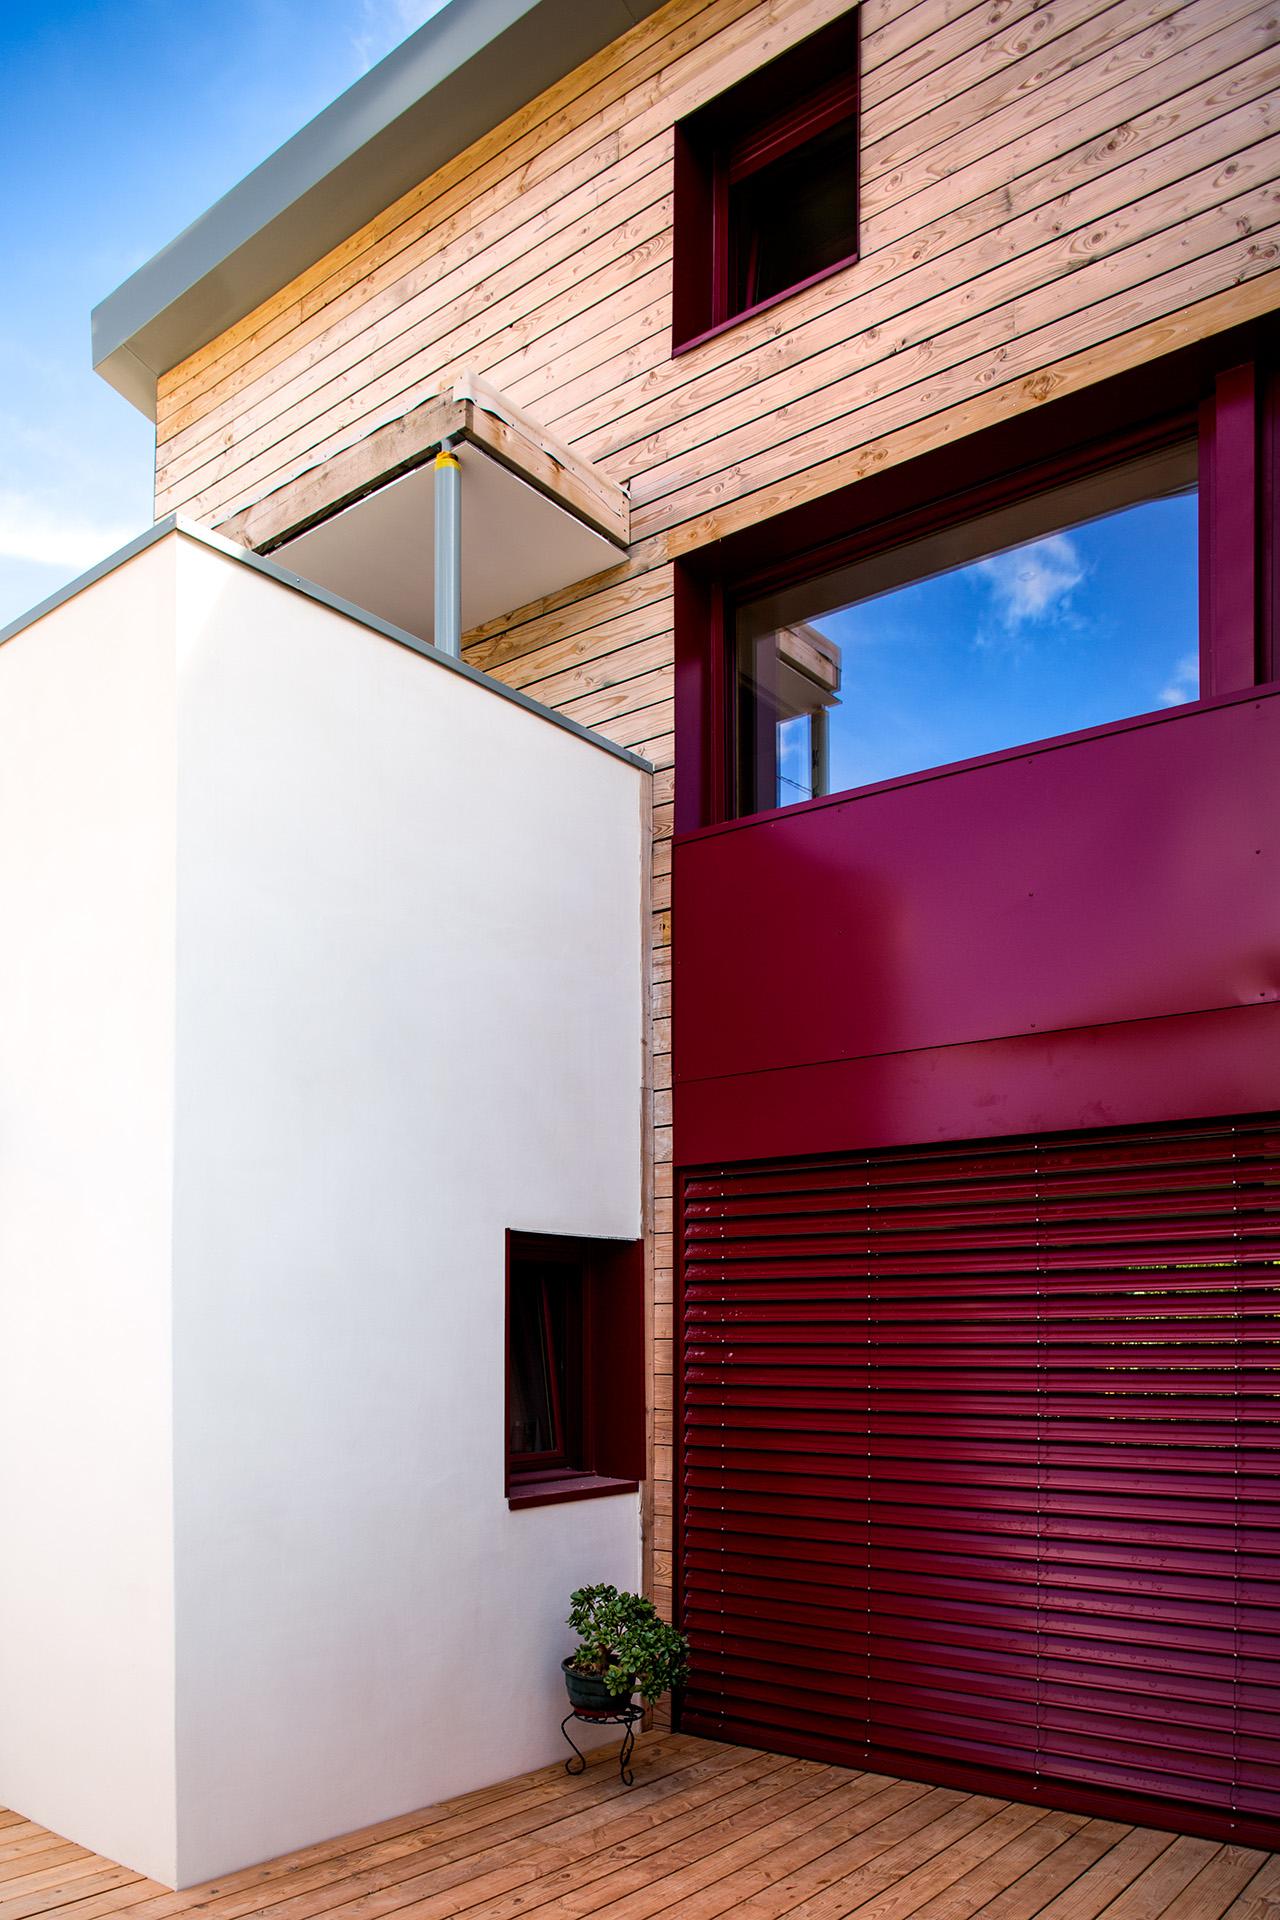 maison c lhenry architecture. Black Bedroom Furniture Sets. Home Design Ideas